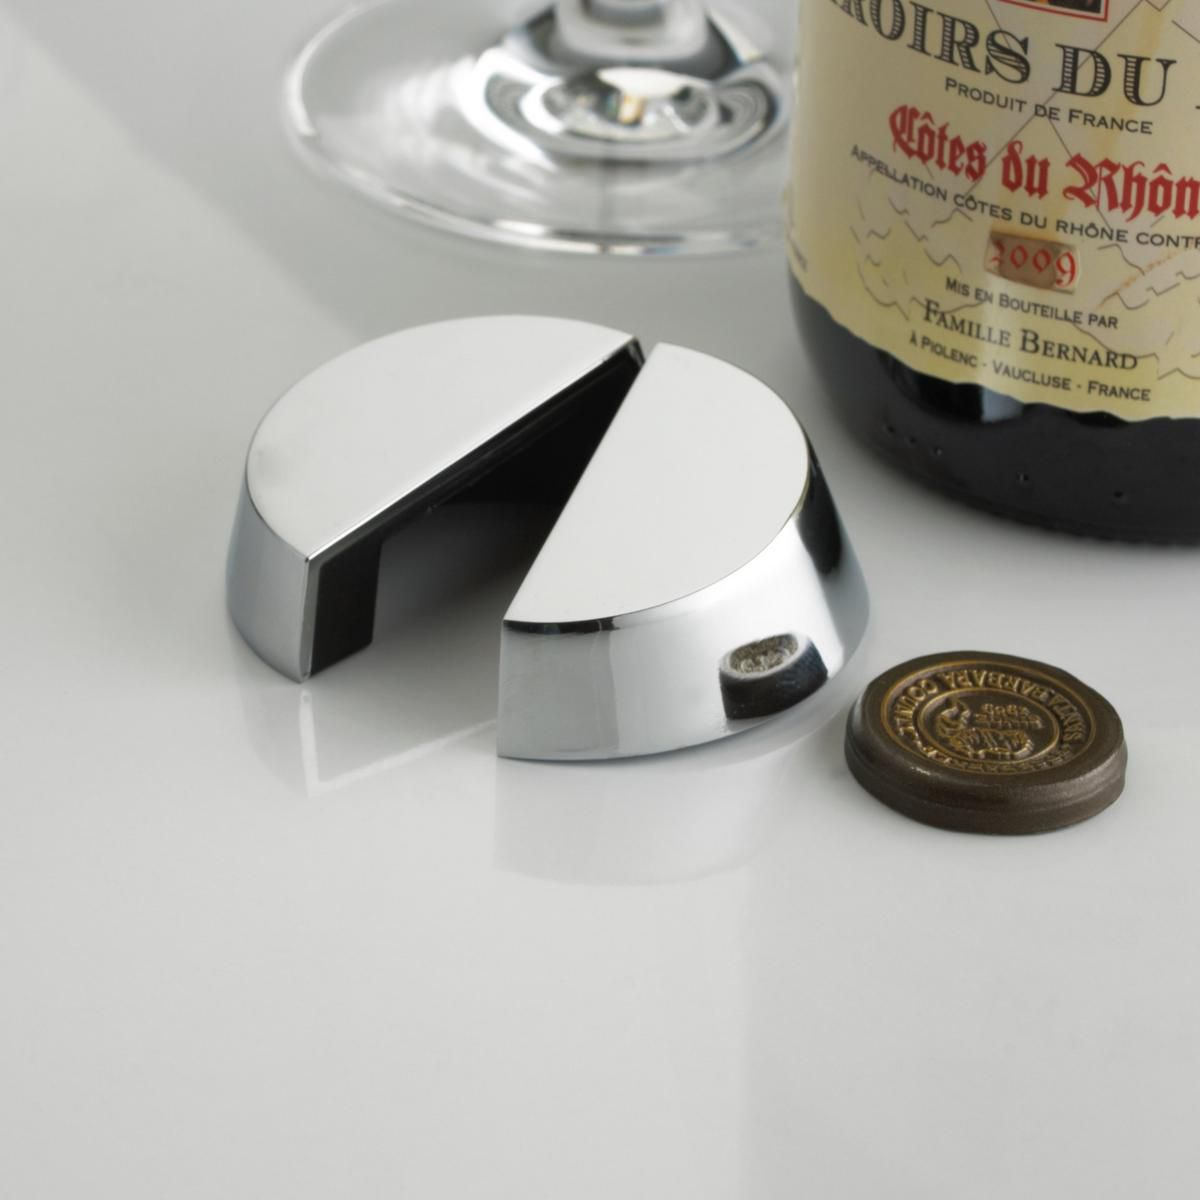 wine-enthusiast-foil-cutter